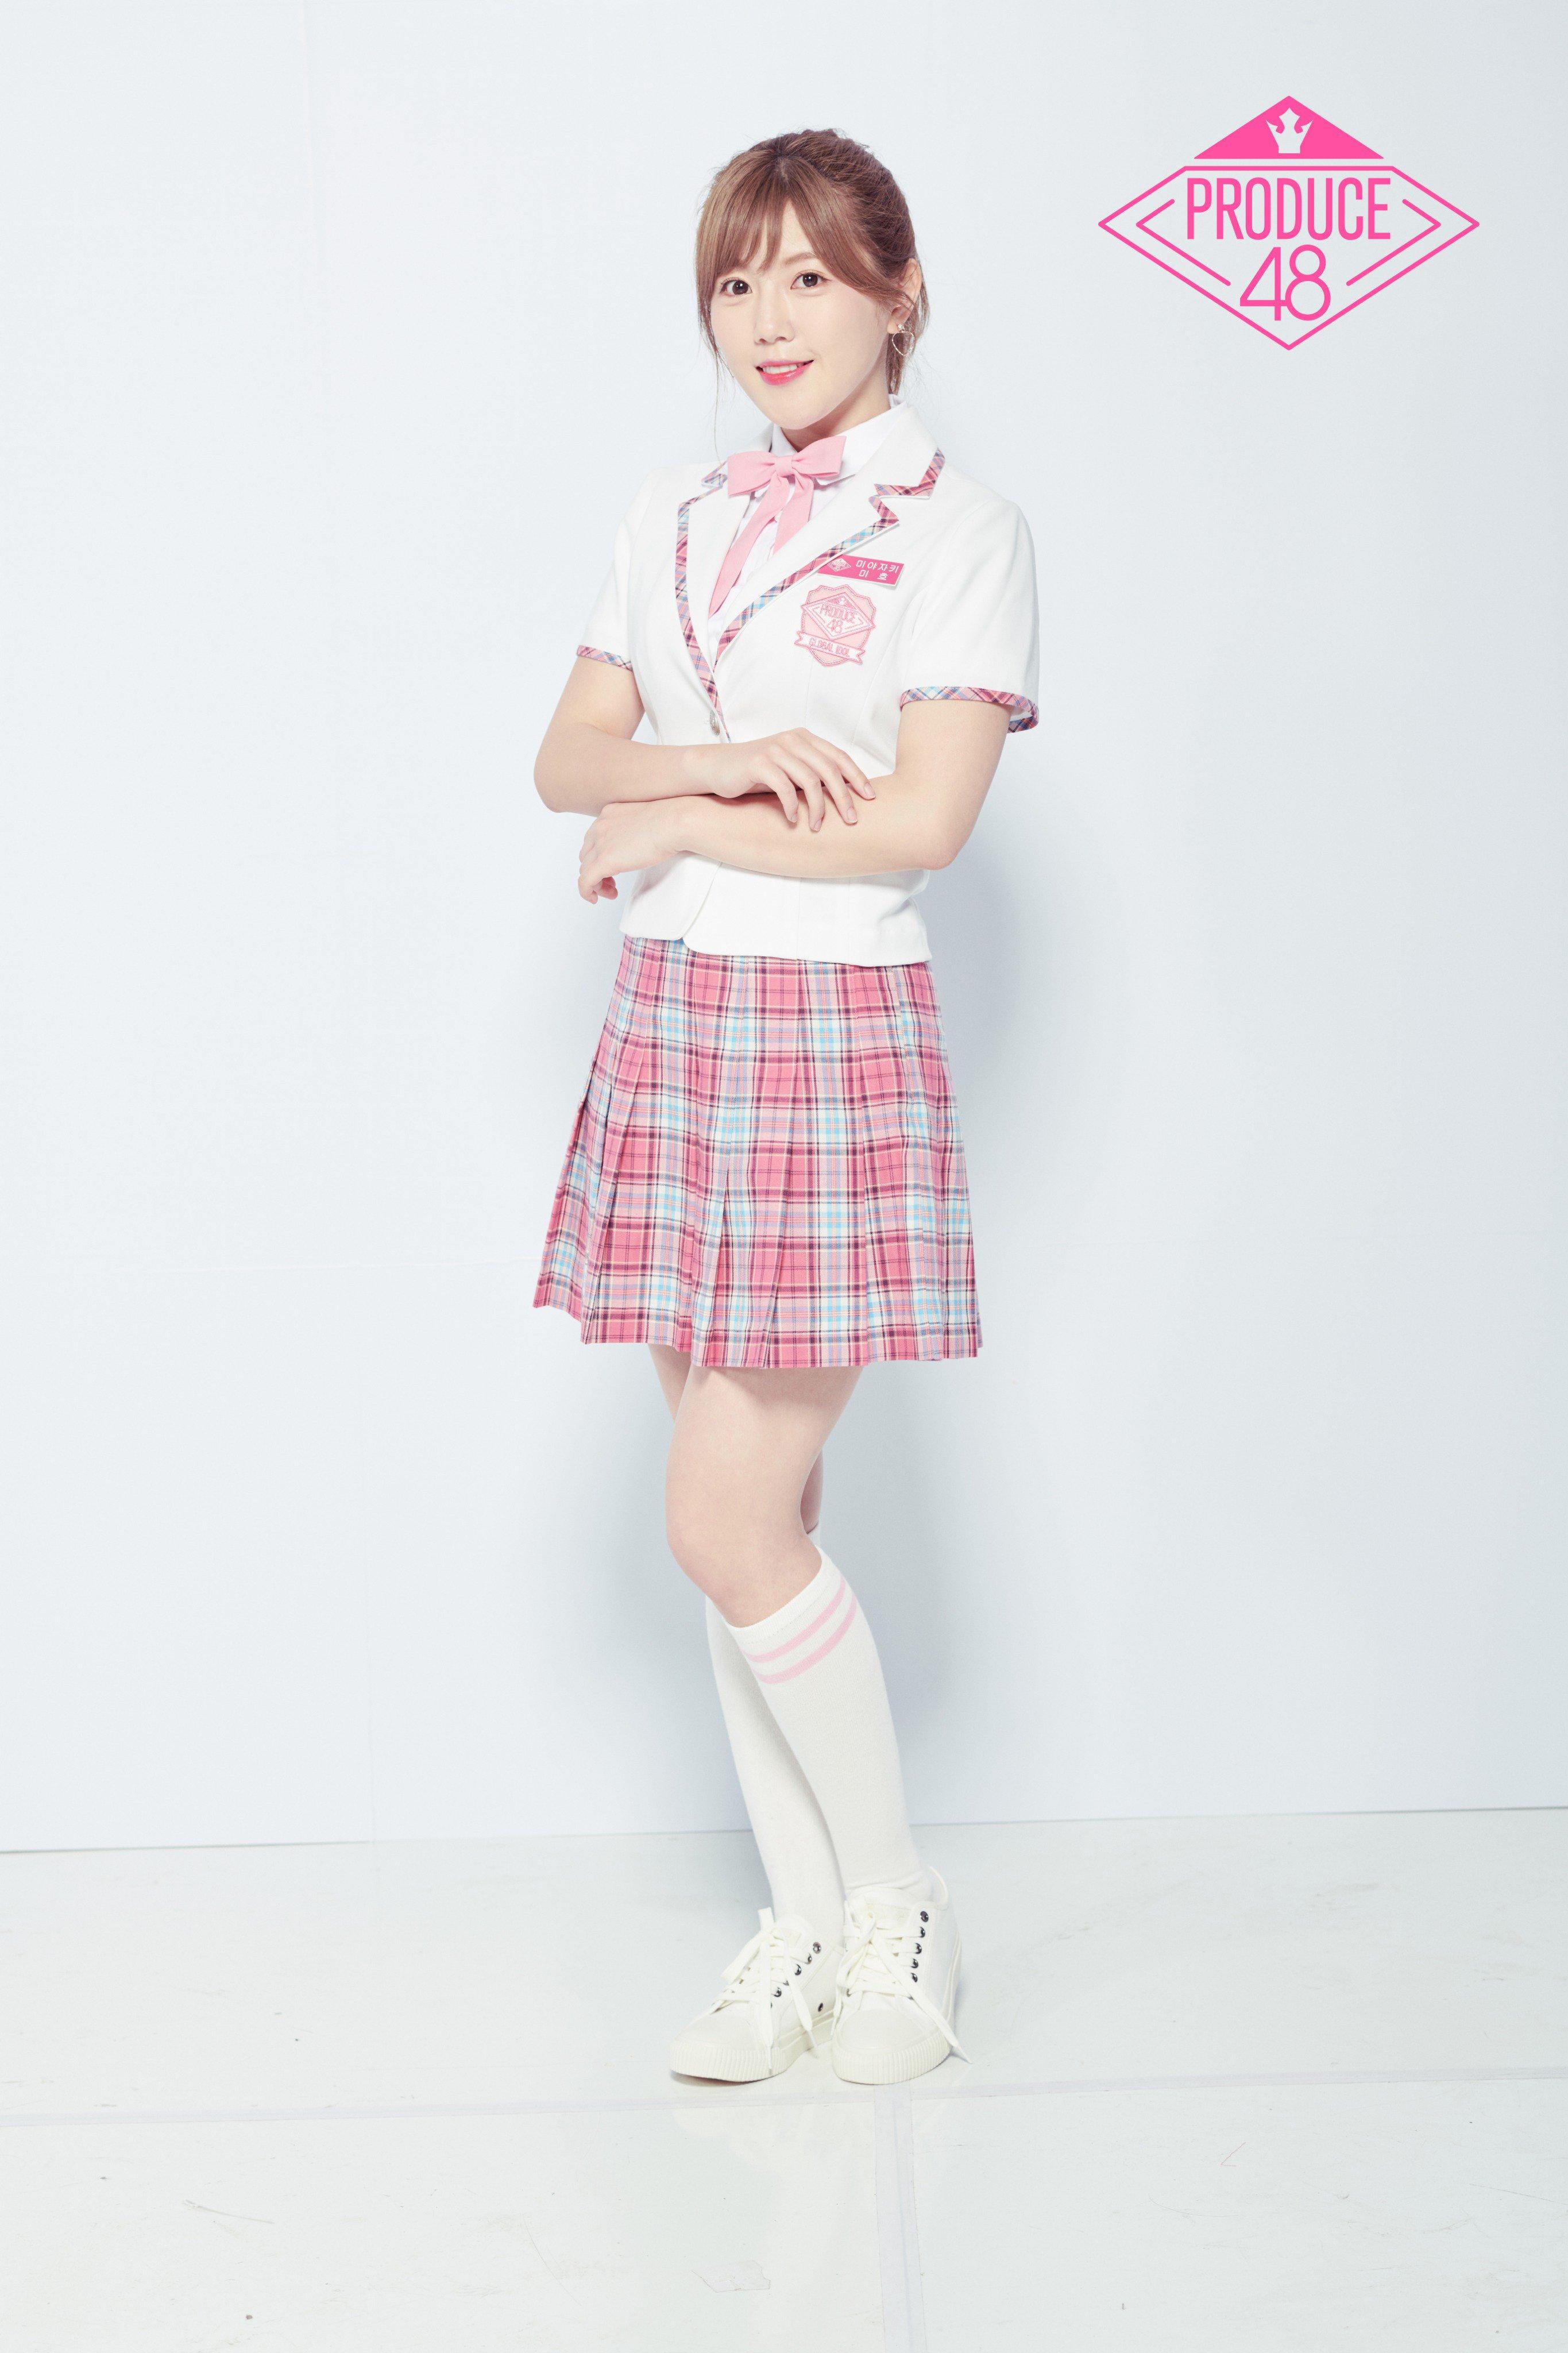 Miyazaki Miho Produce 48 - K-Pop Database / dbkpop com